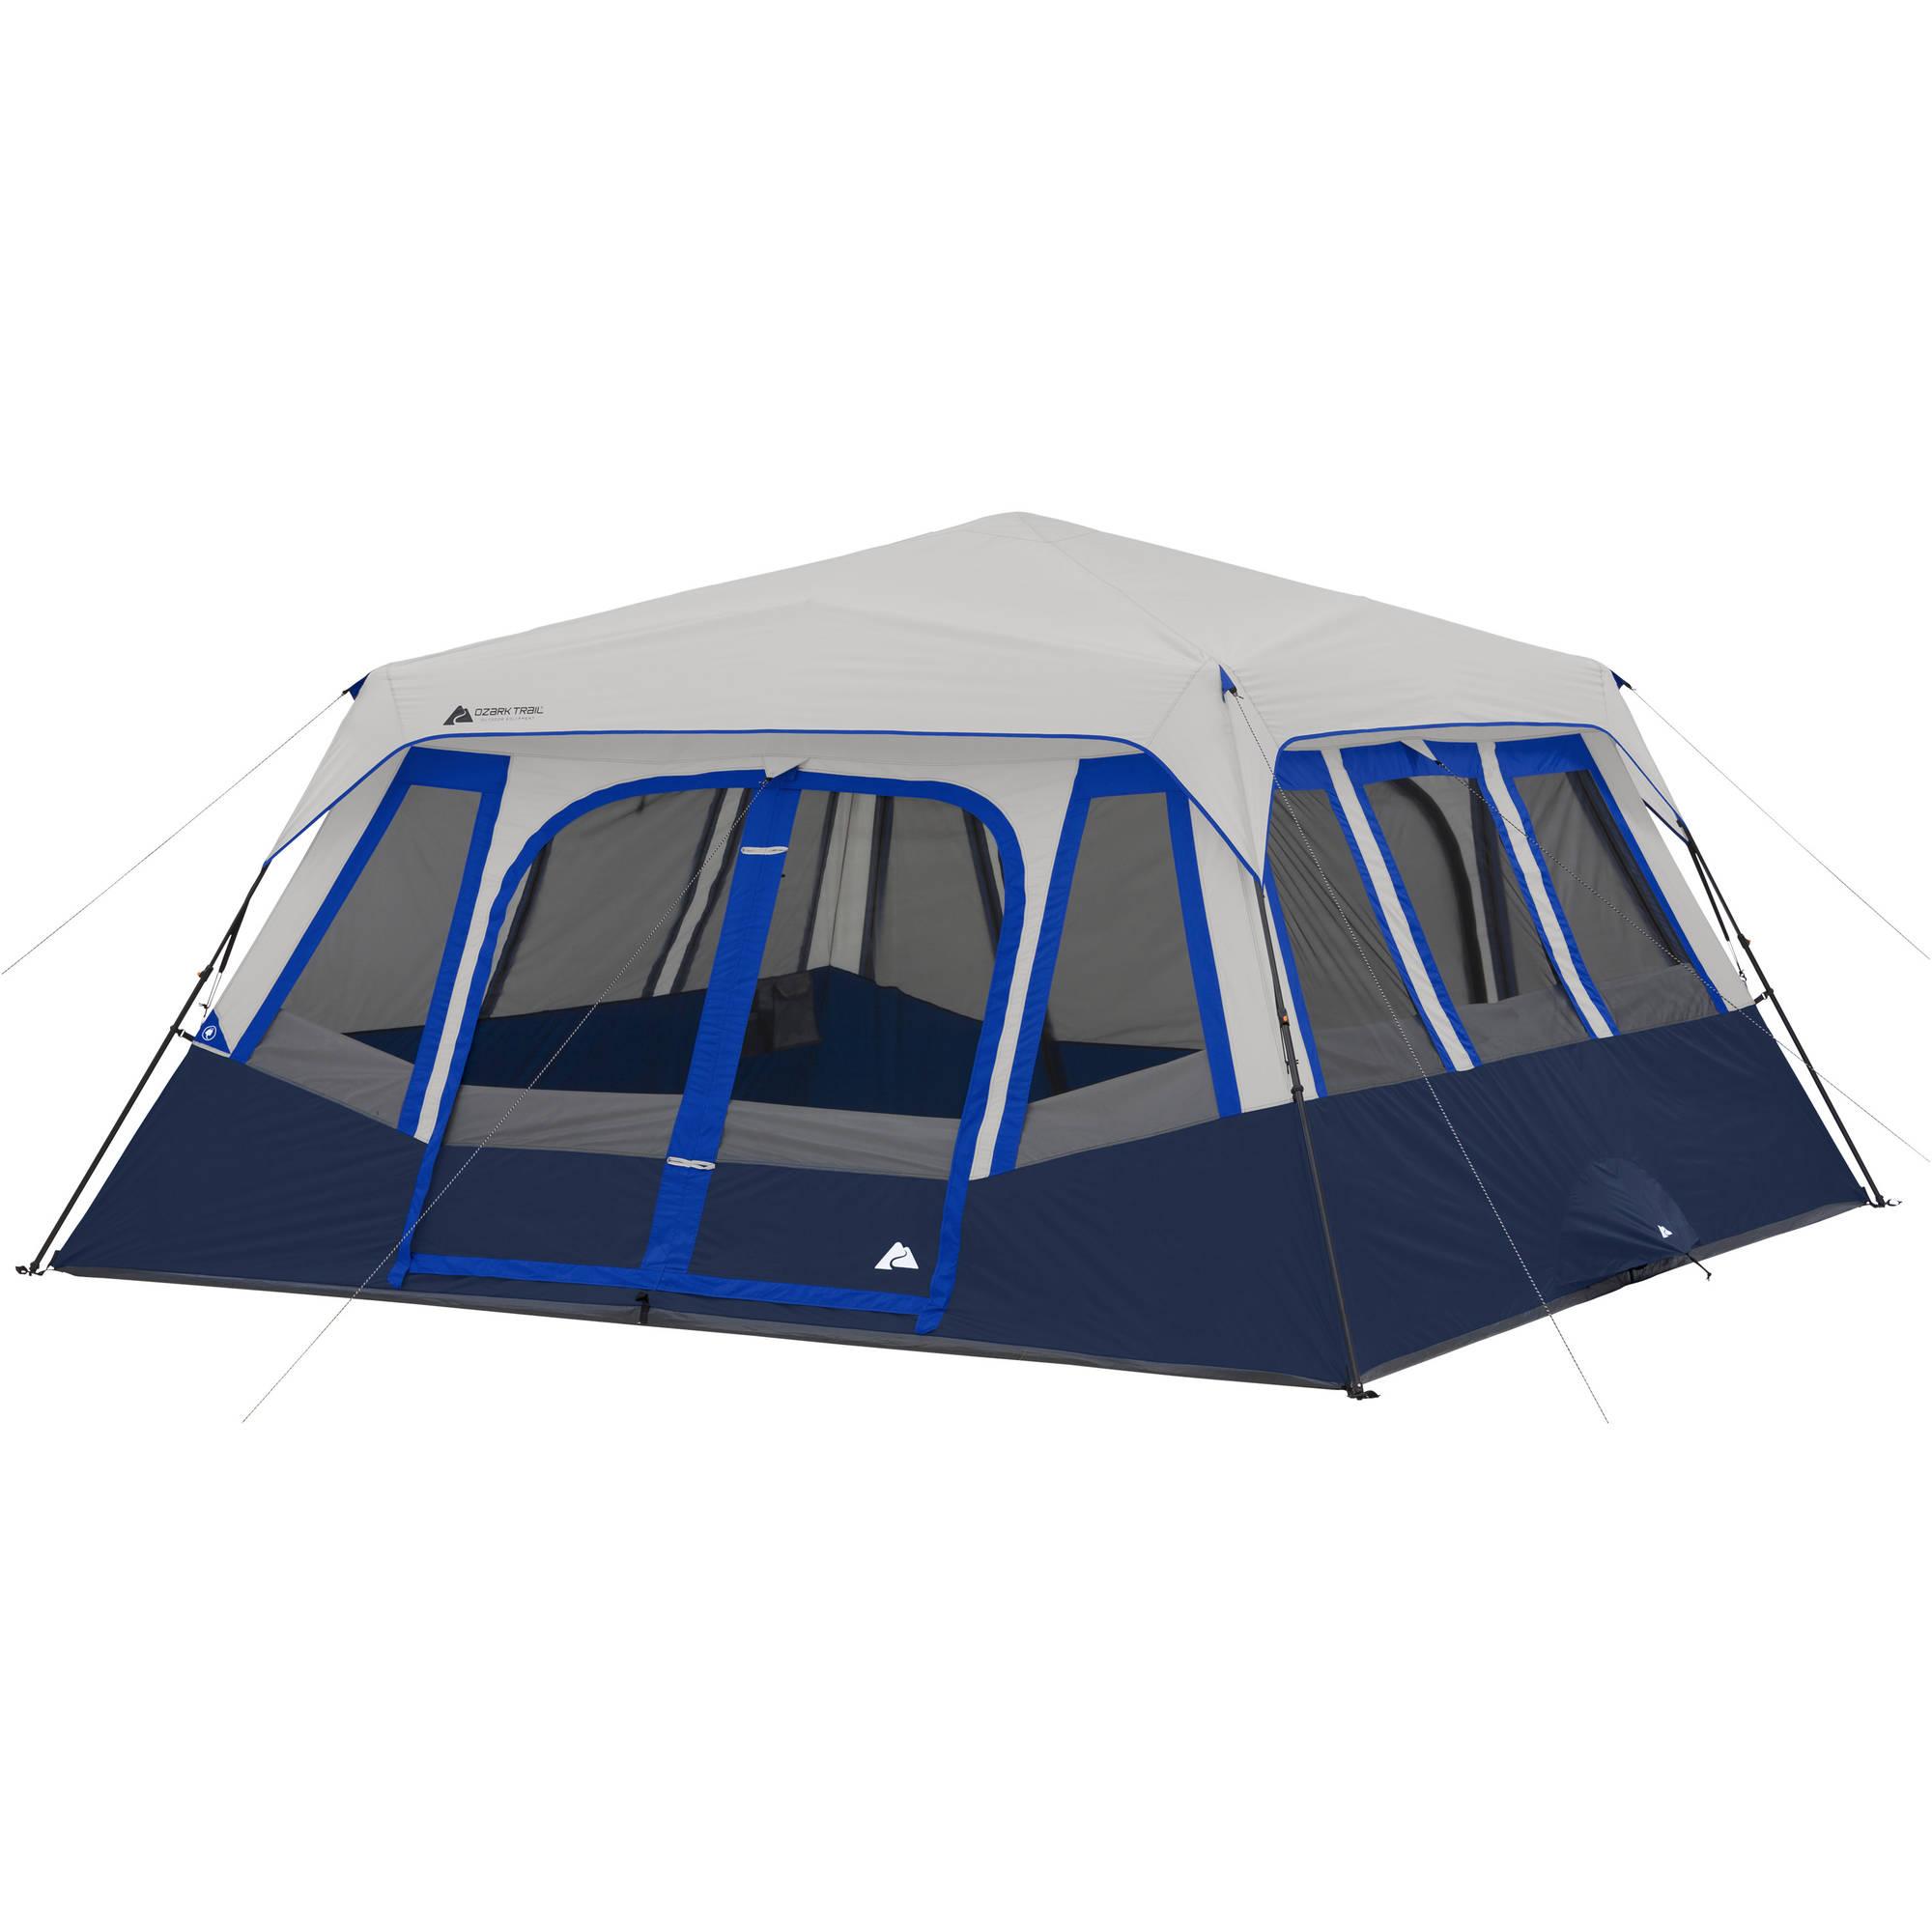 Ozark Trail 14 Person 2 Room Instant Cabin Tent Walmart Com